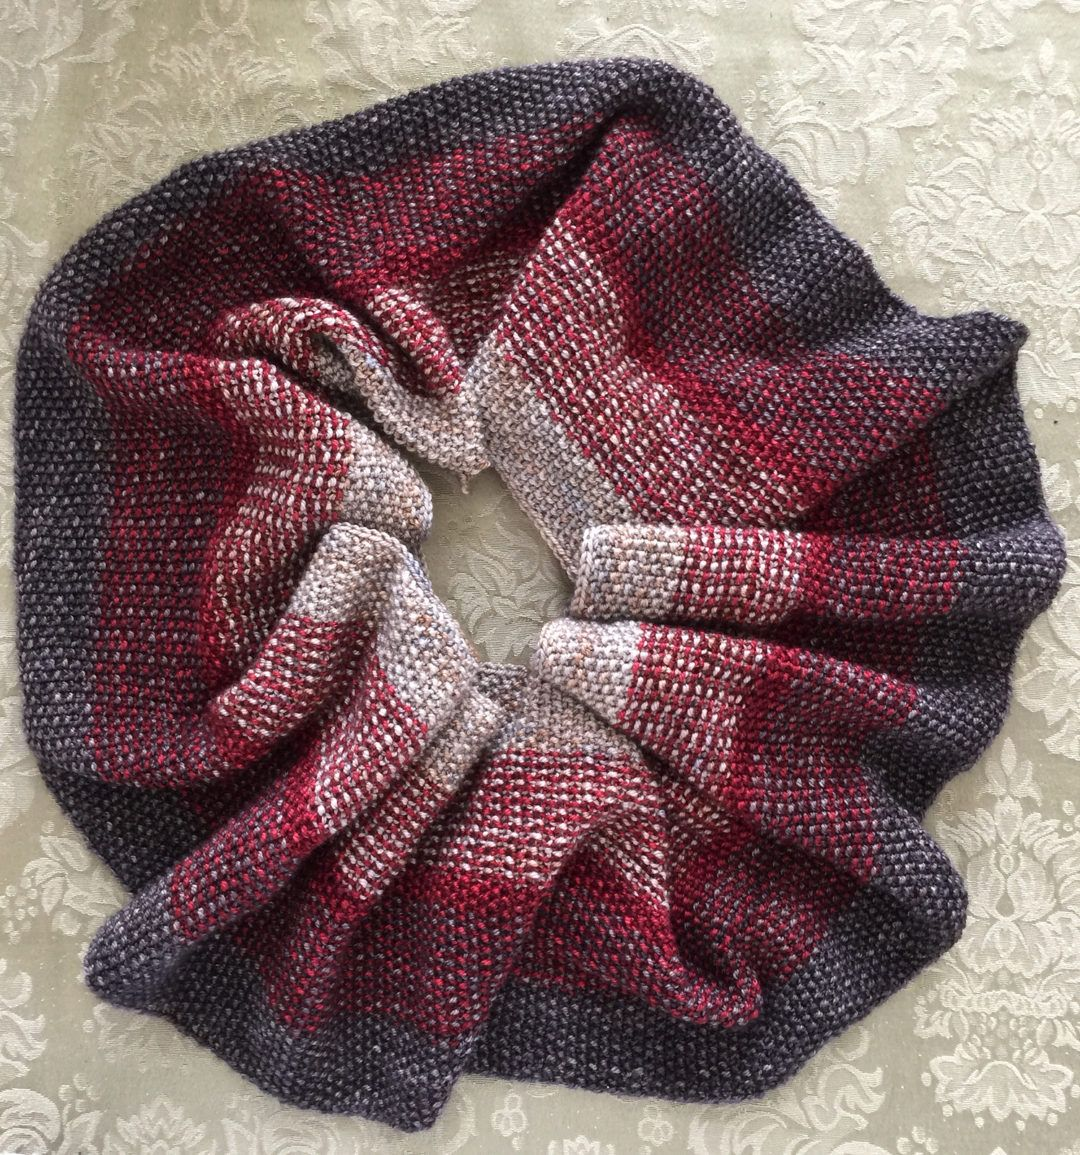 Free Knitting Pattern for Nightfall Infinity Scarf Cowl | Yarn ...